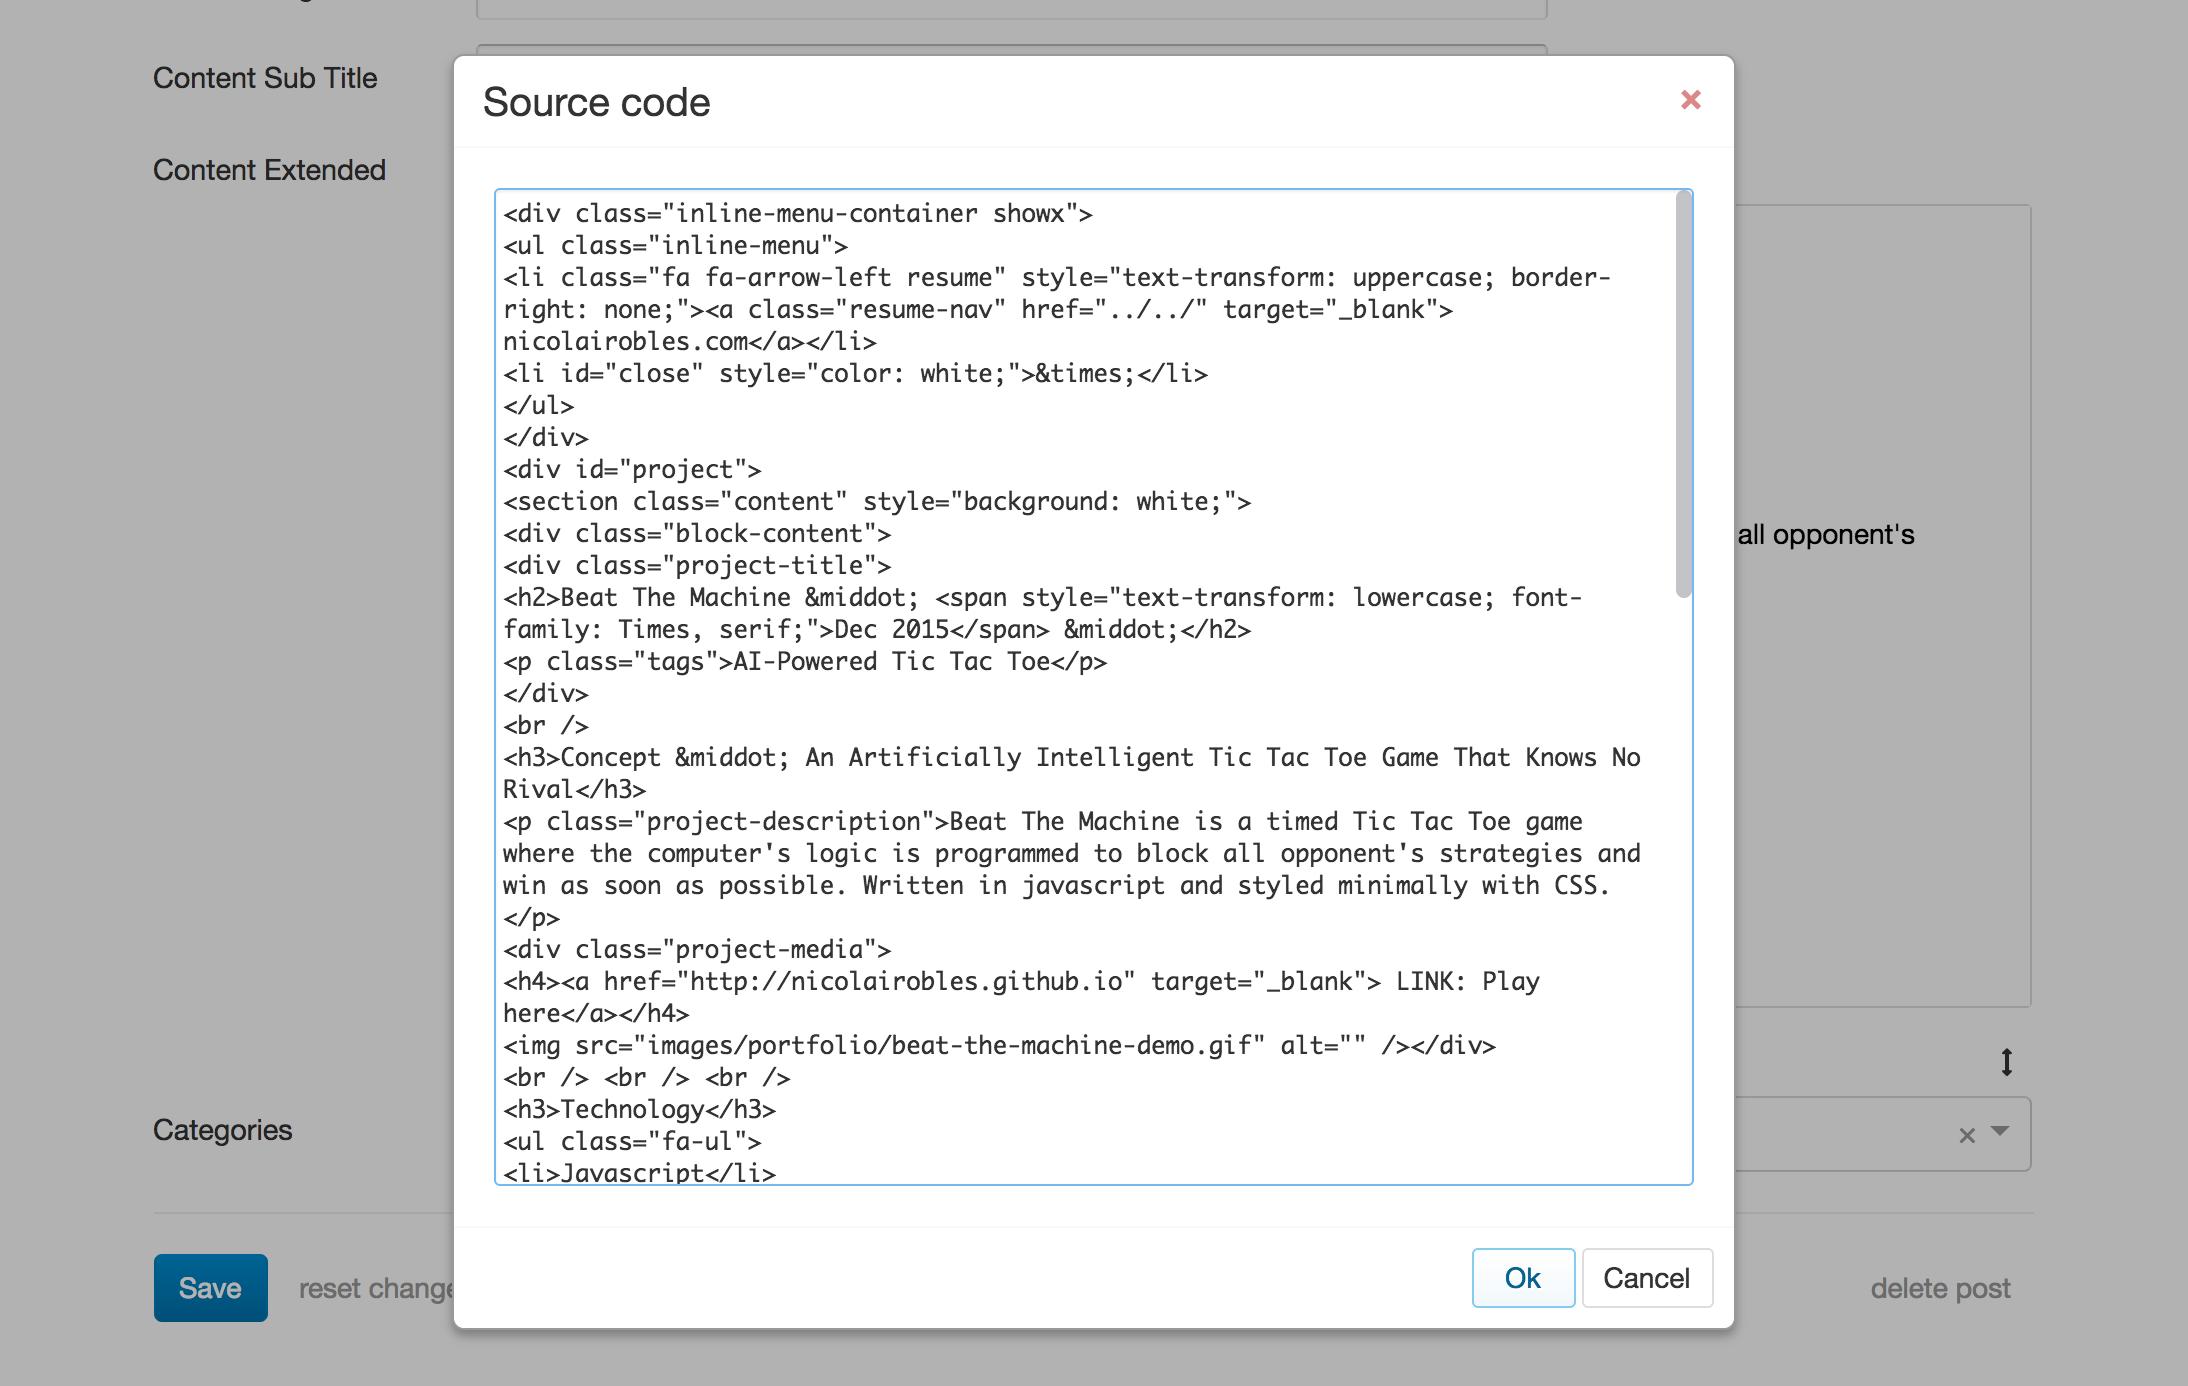 cms-source-code